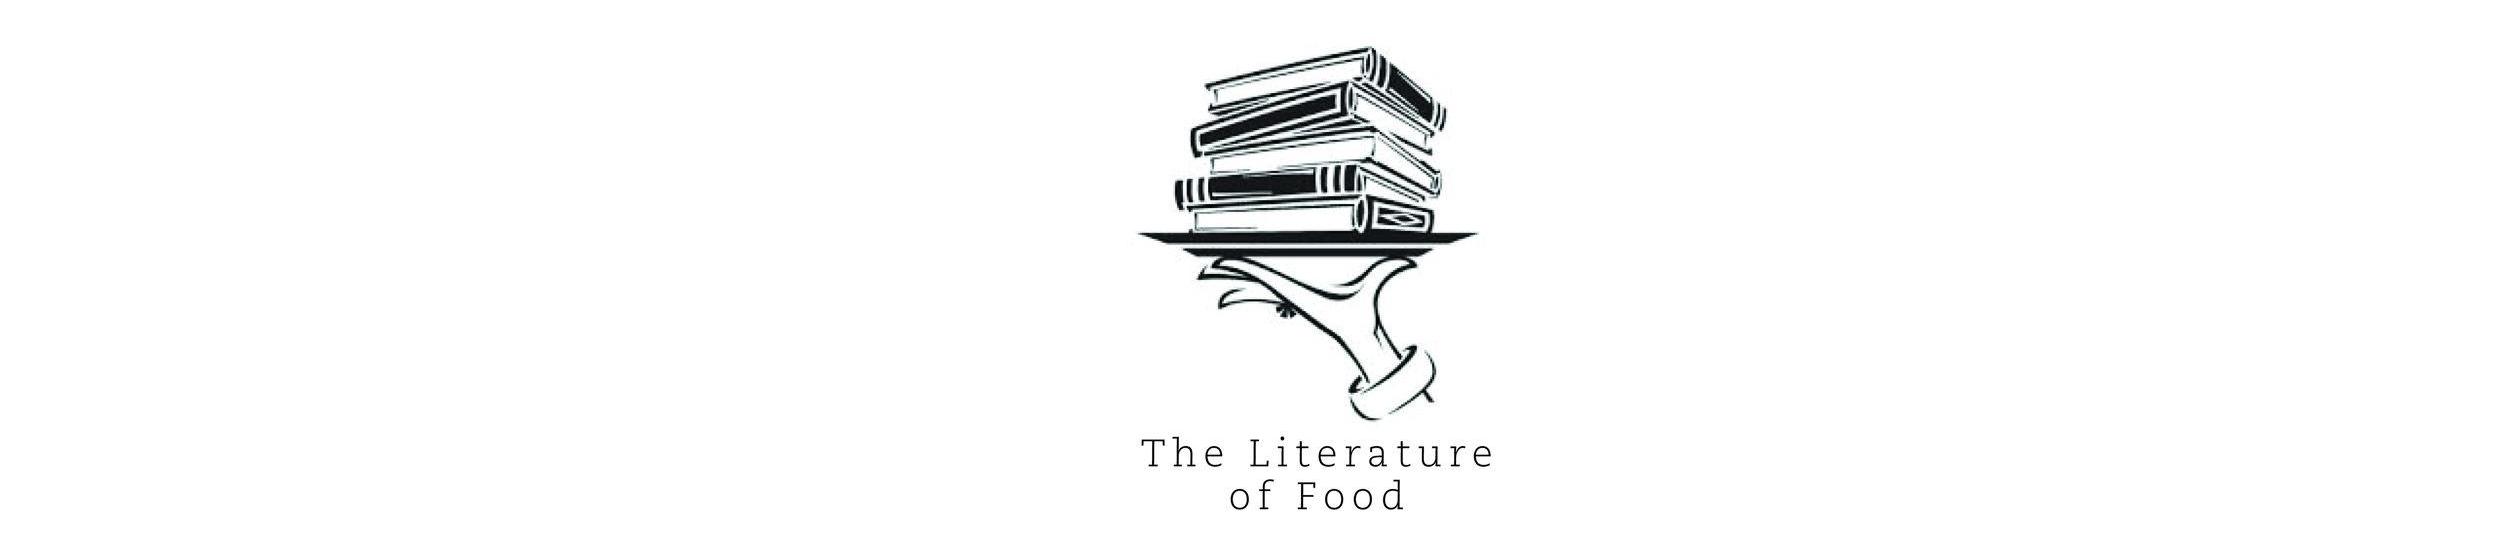 Literature of Food Header.jpg